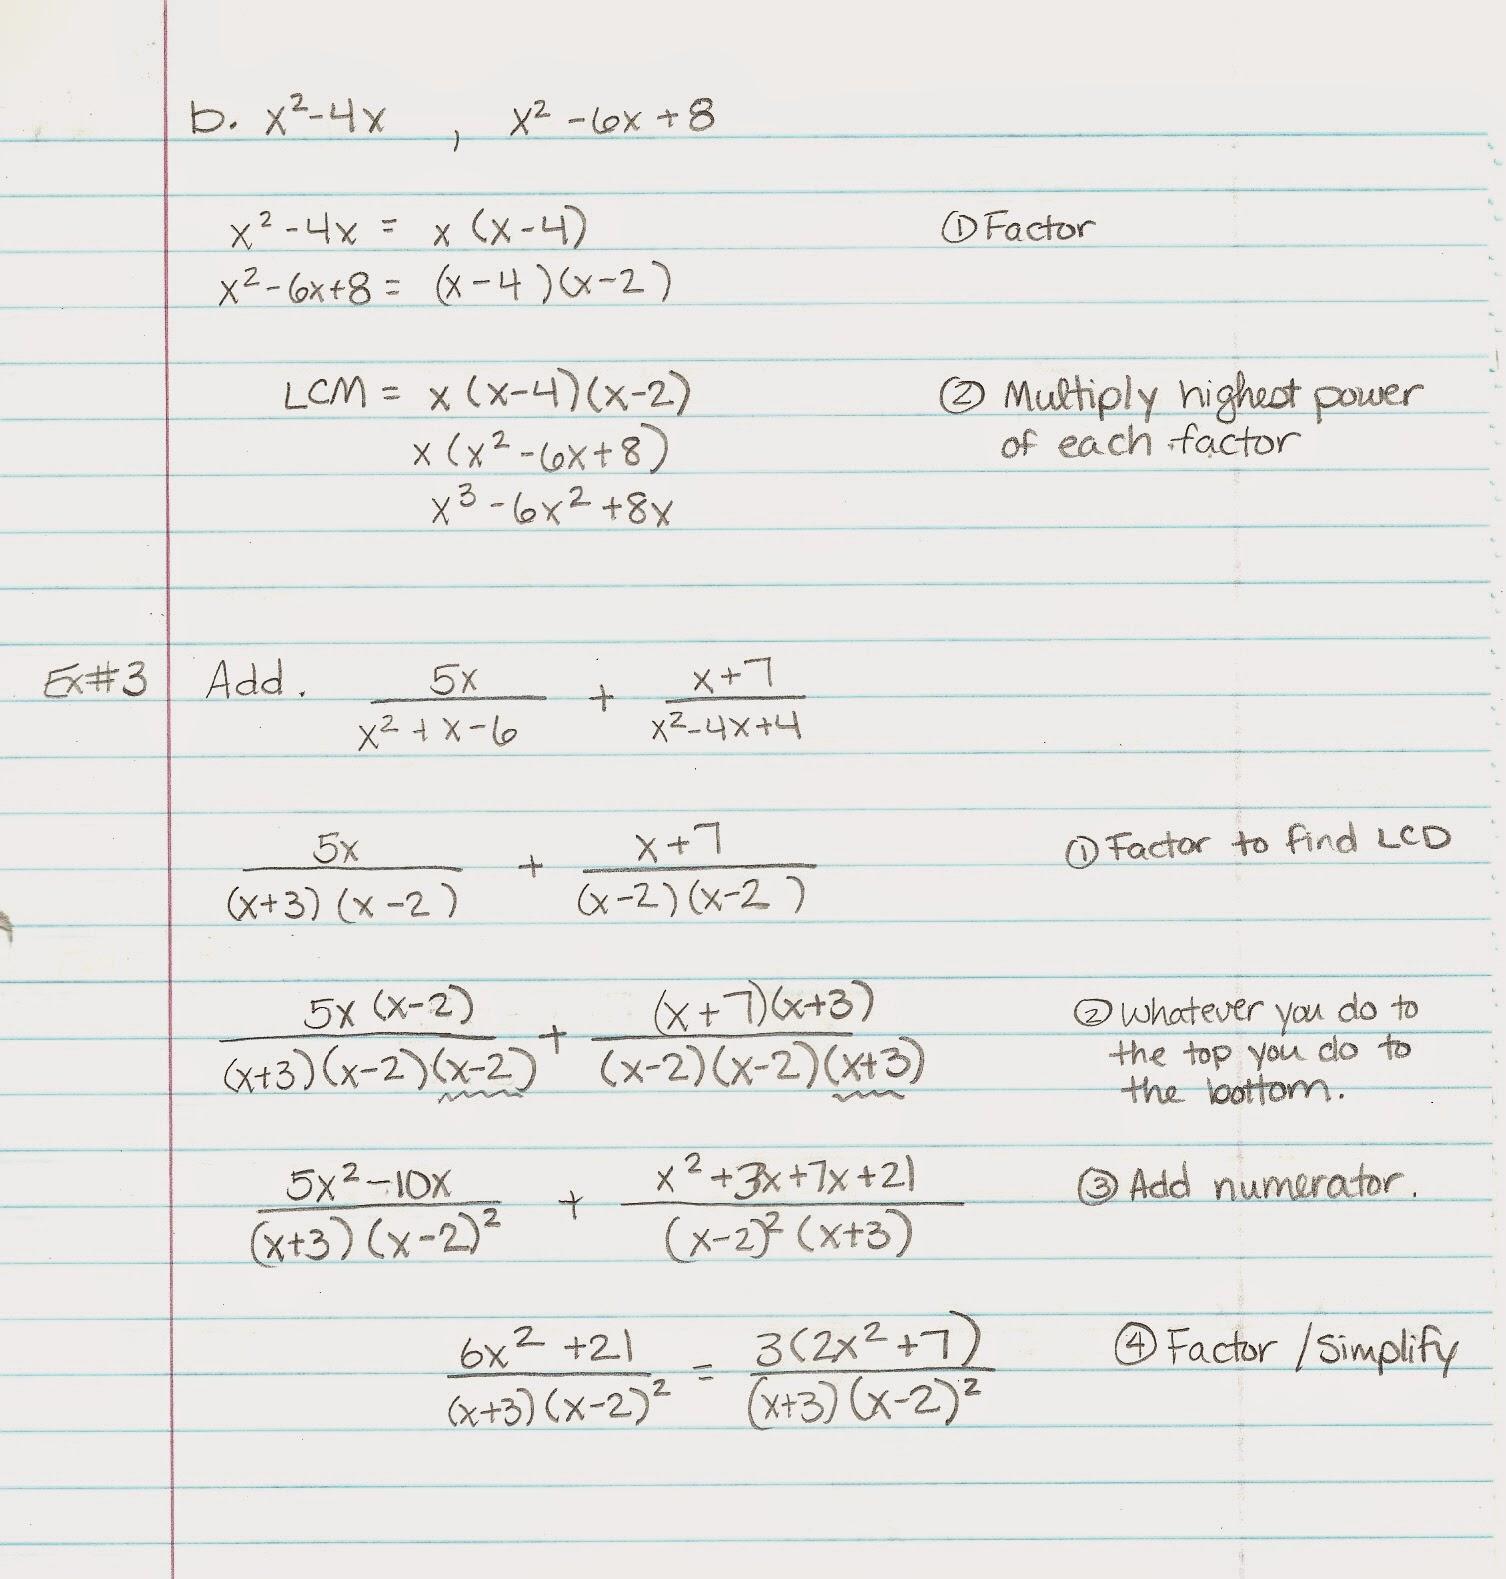 worksheet Algebra 2 Adding And Subtracting Rational Expressions Worksheet Answers algebra alerts 1 and 2 alg 9 3 adding subtracting rational expressions thurs 226